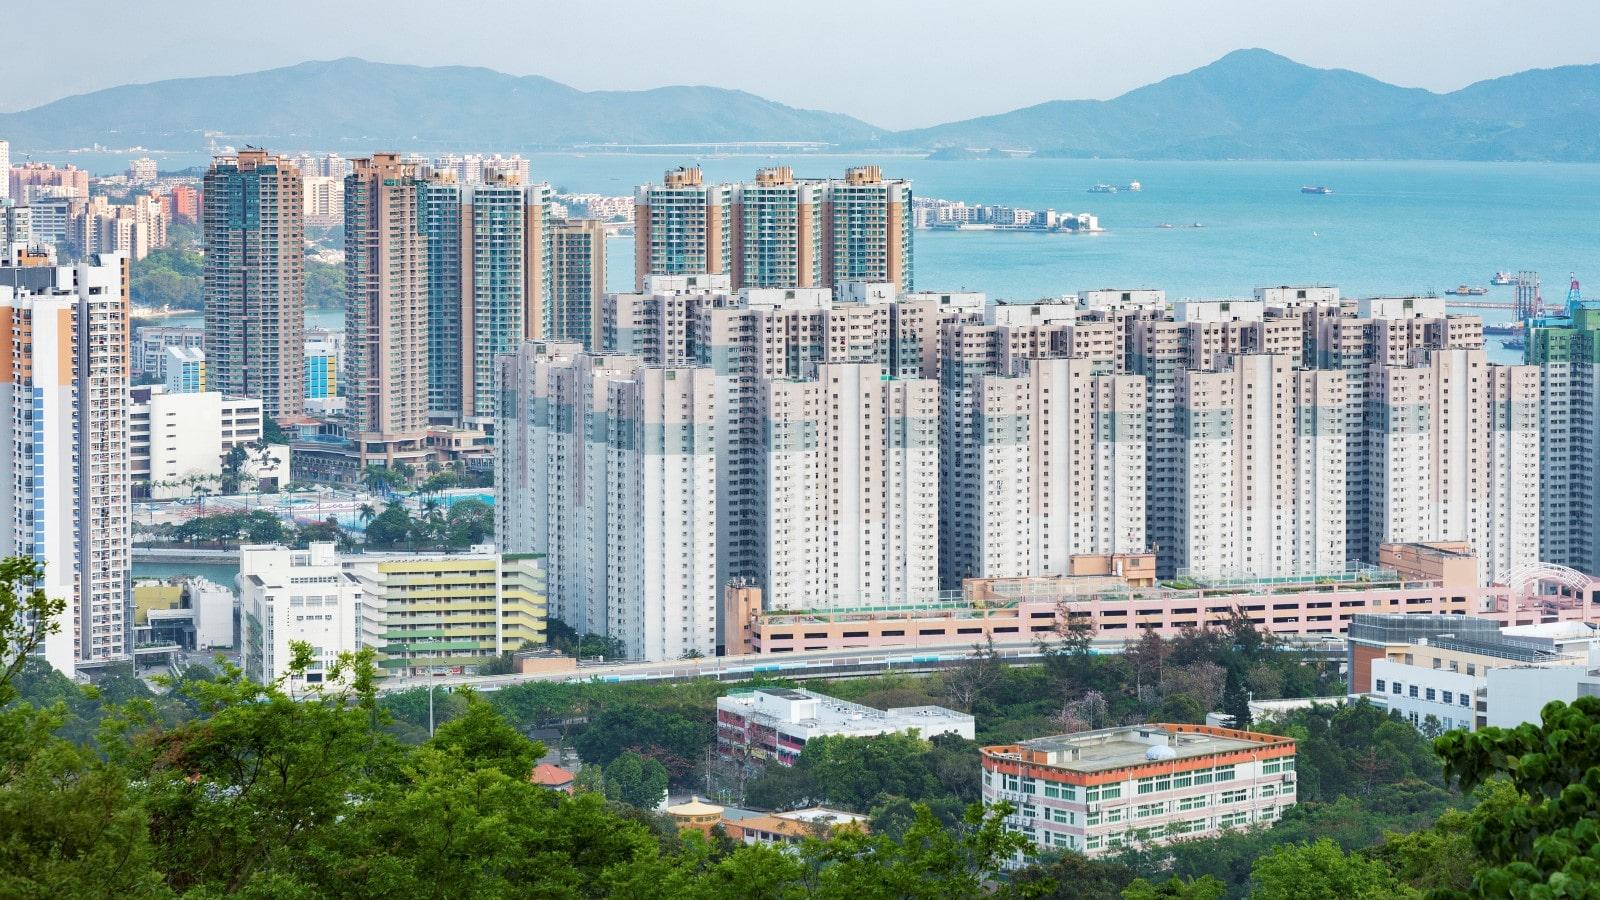 Aerial view of Tuen Mun city in Hong Kong